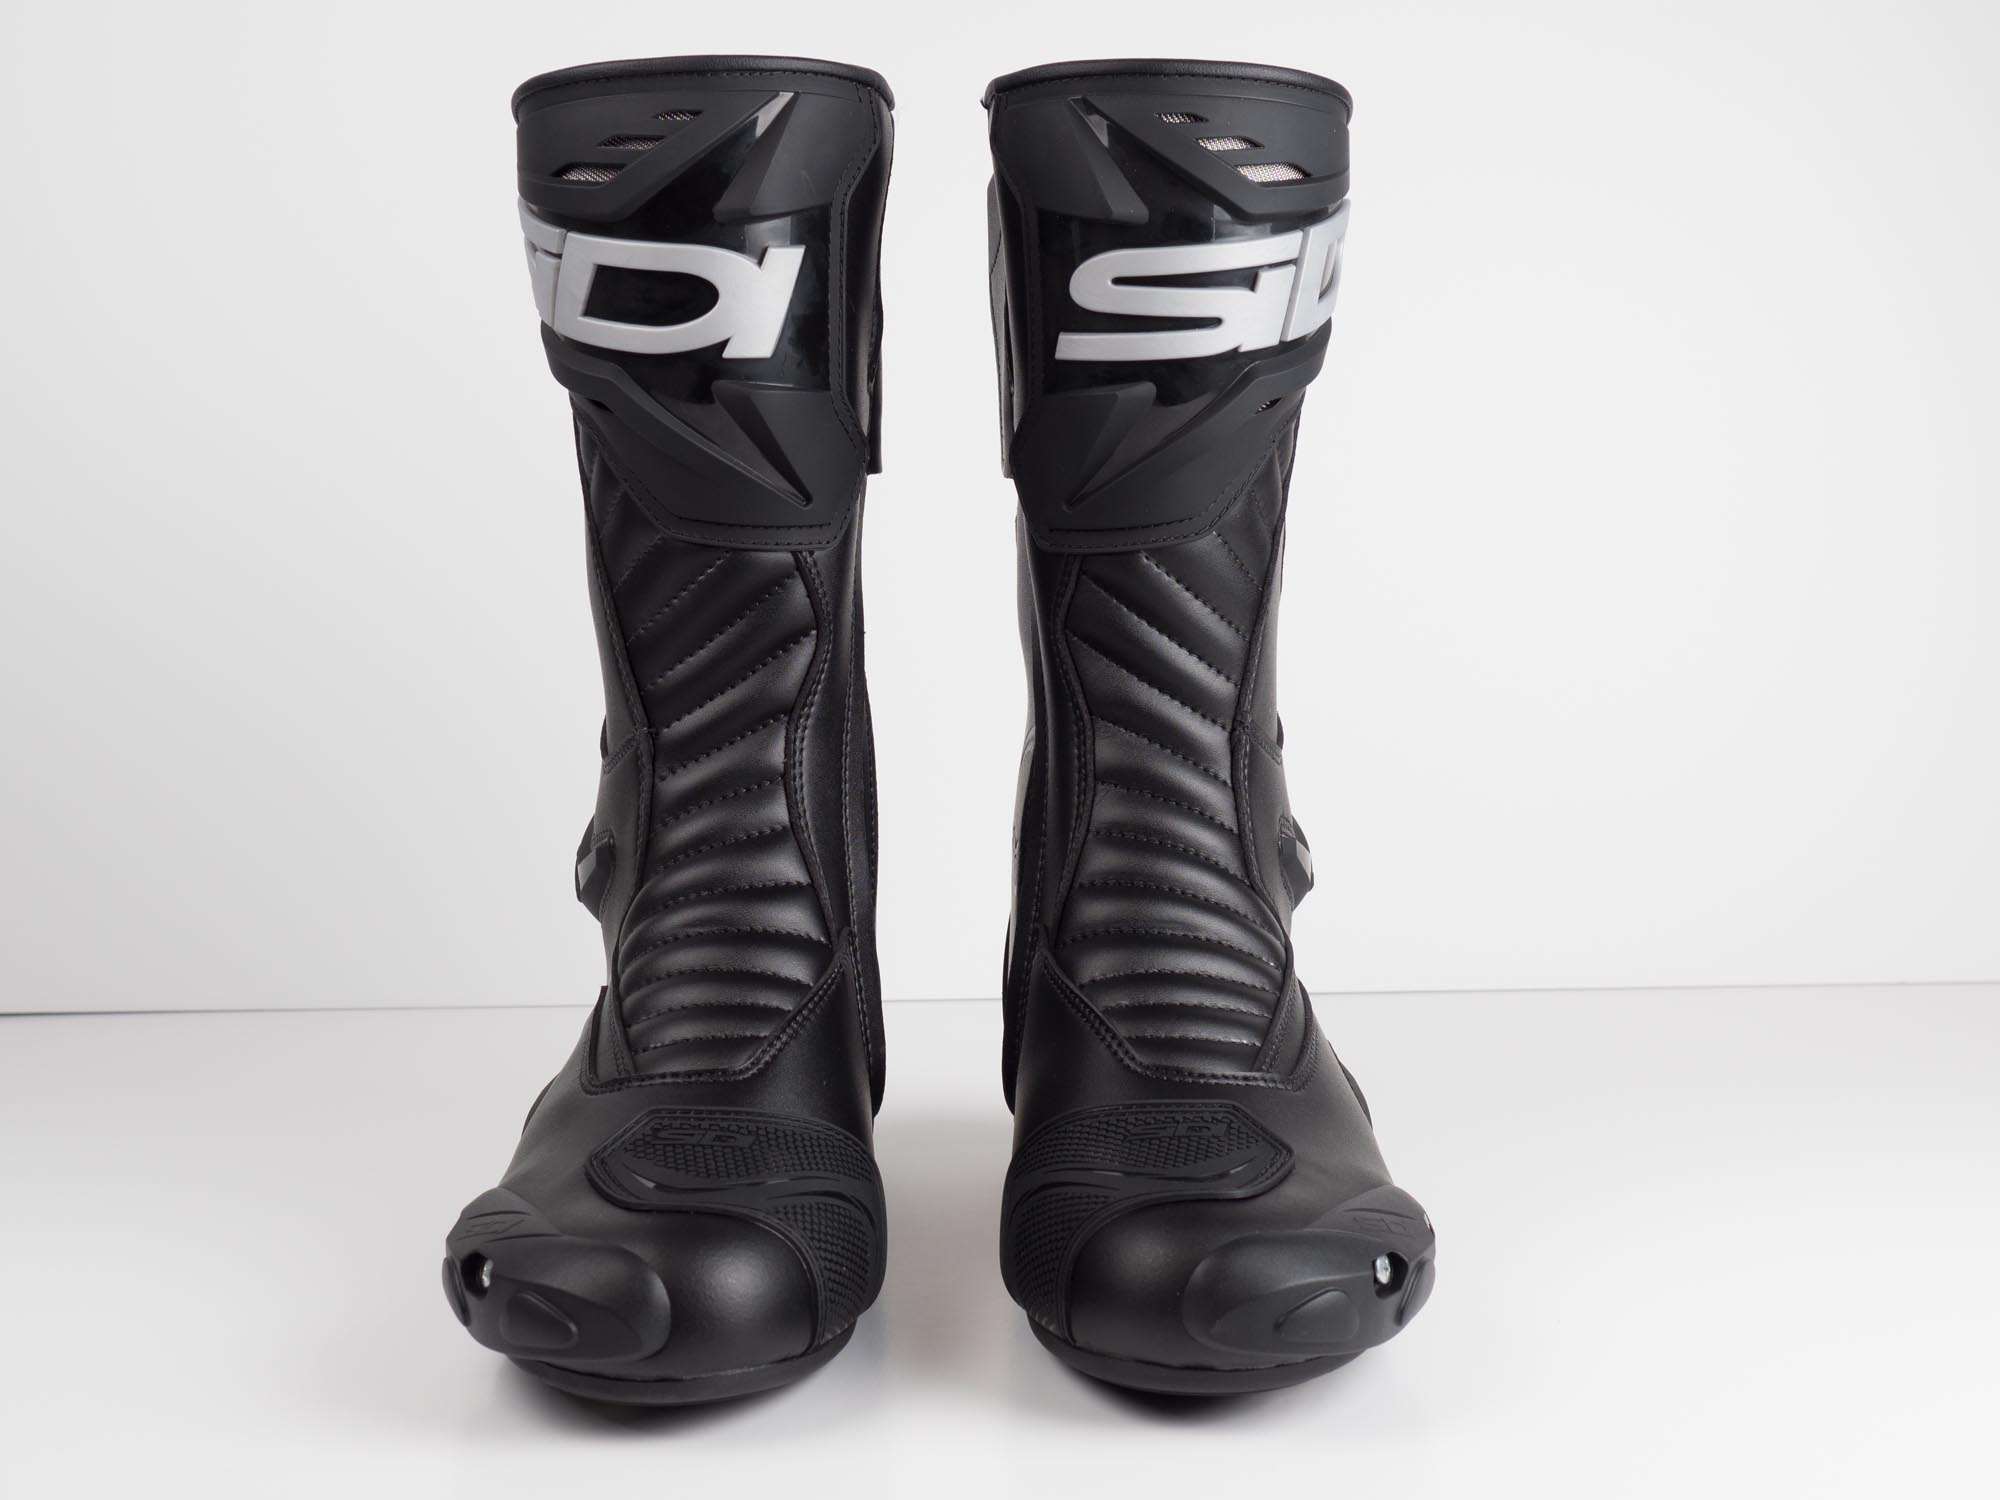 SIDI-Performer-Boots_002-1